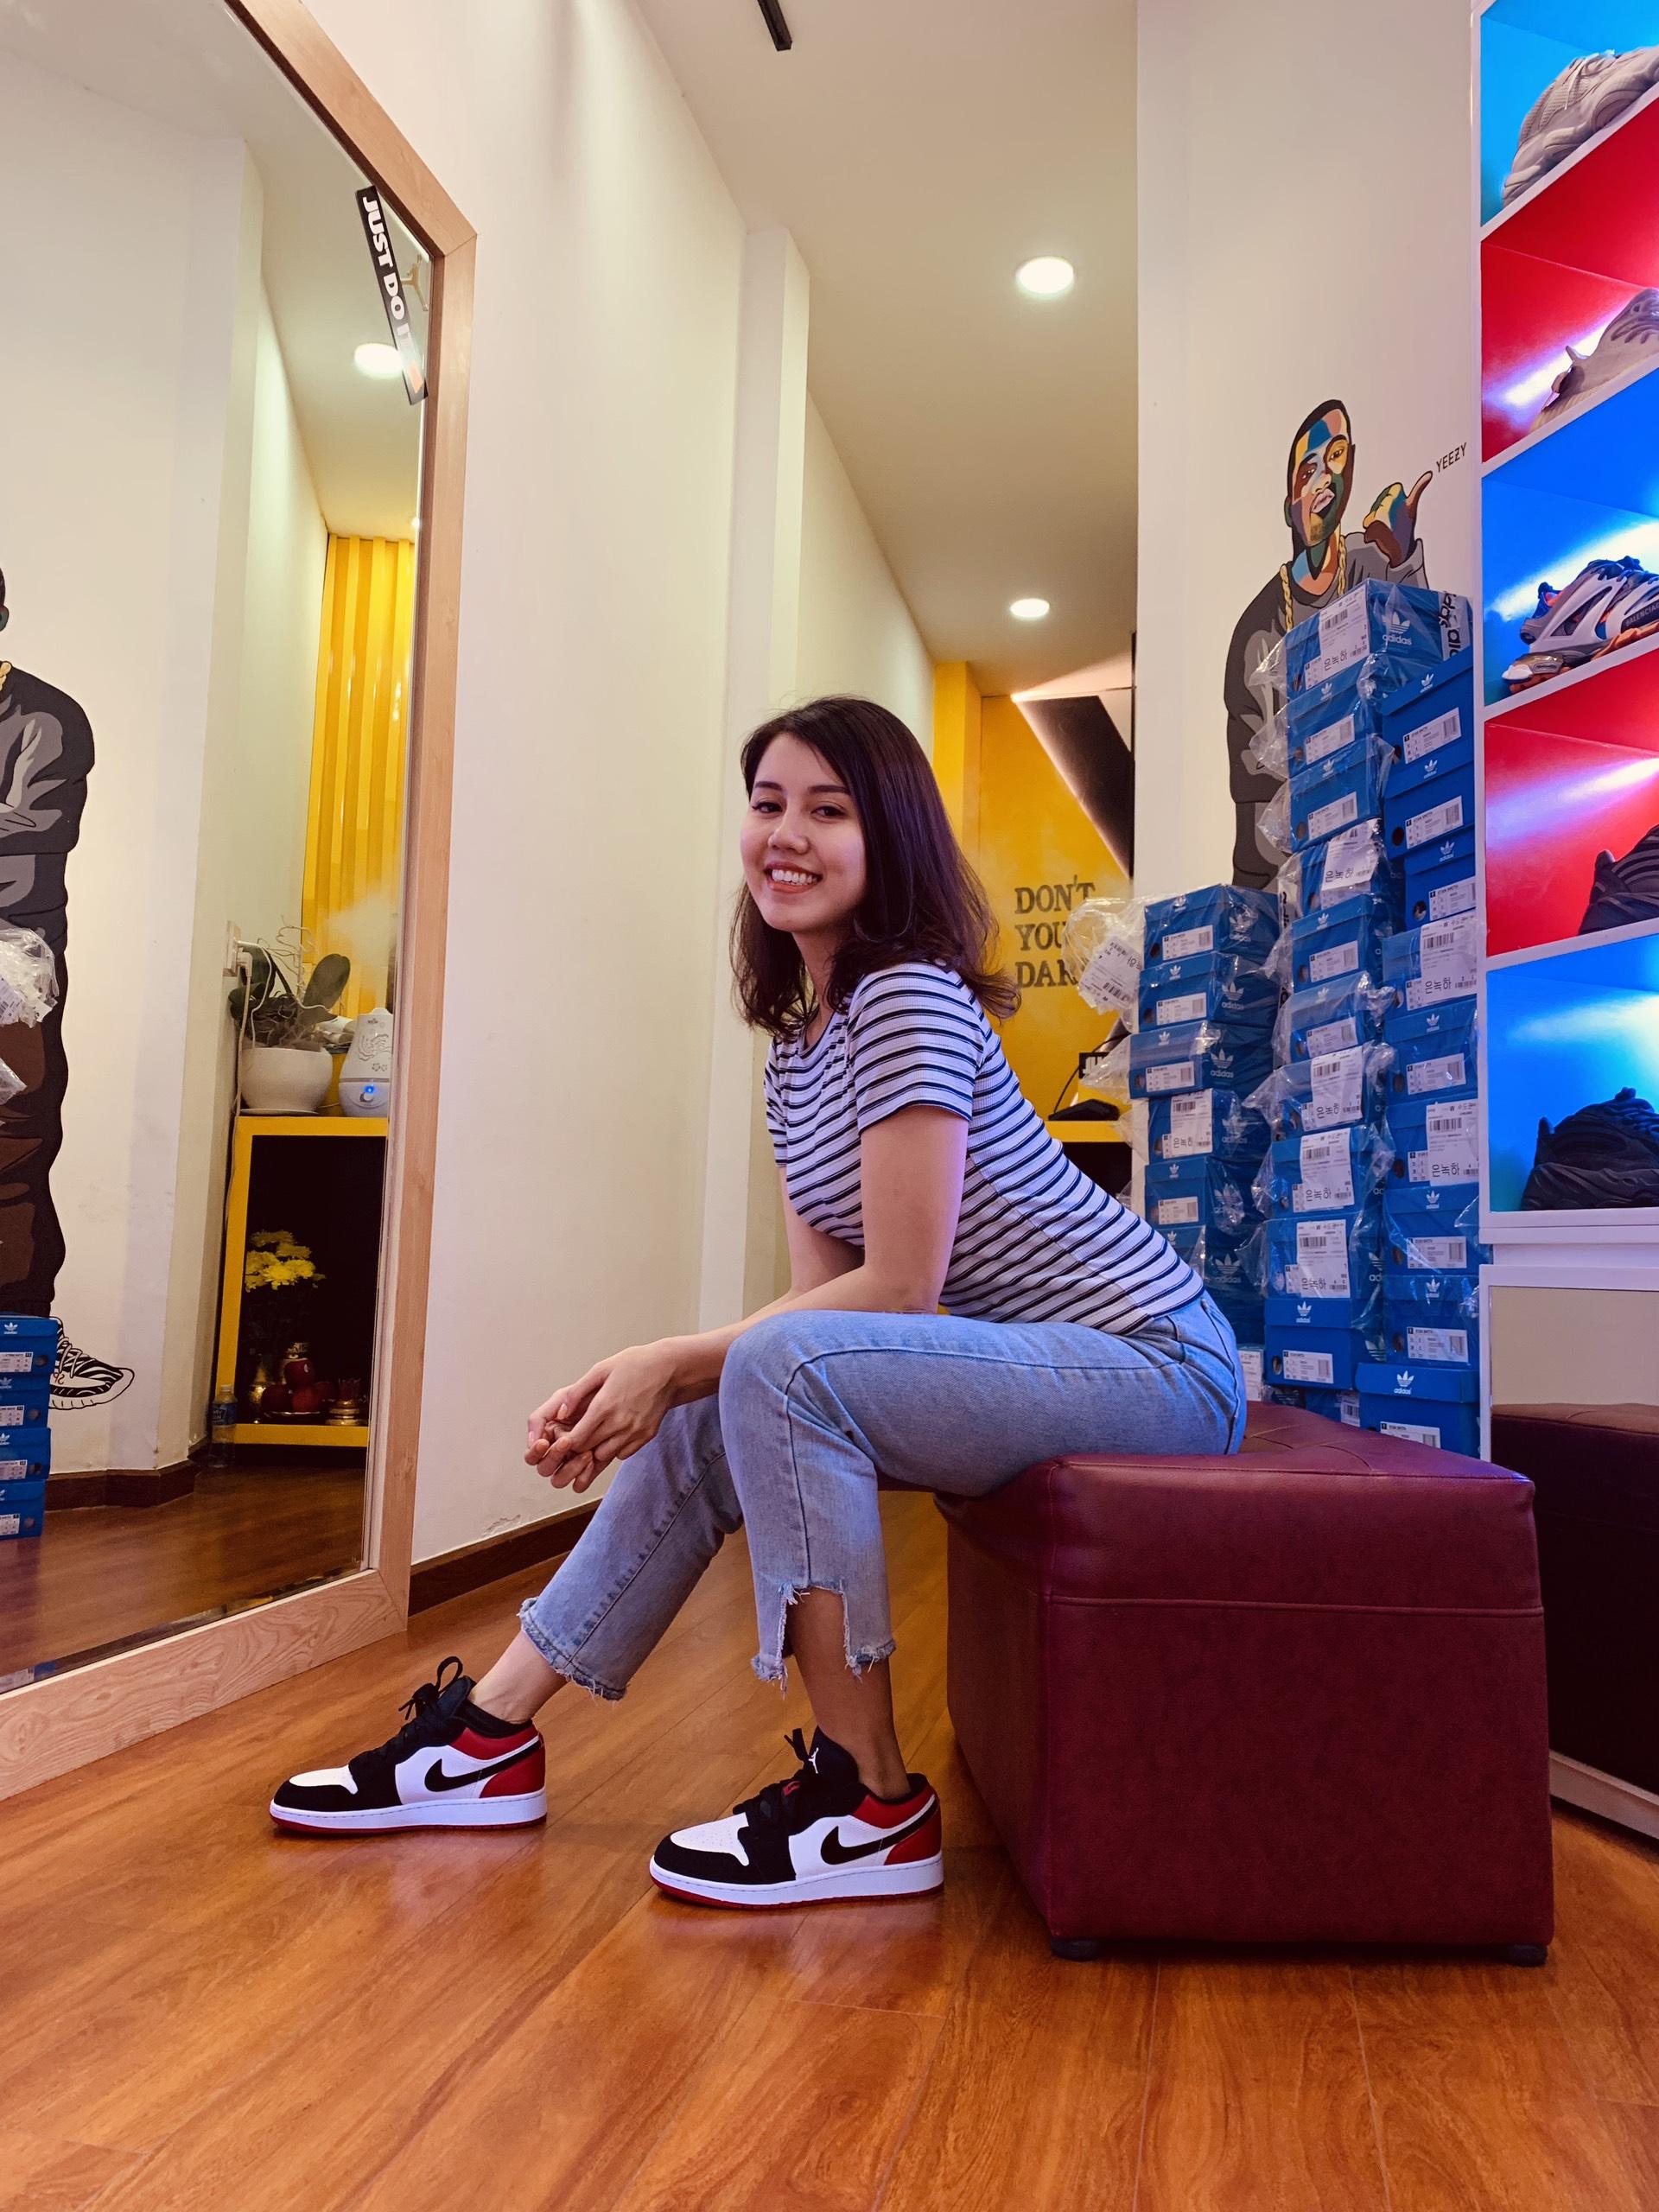 king-Shoes-Sneaker-chinh-hang-HCM-hinh-anh-thuc-te-cua-hang